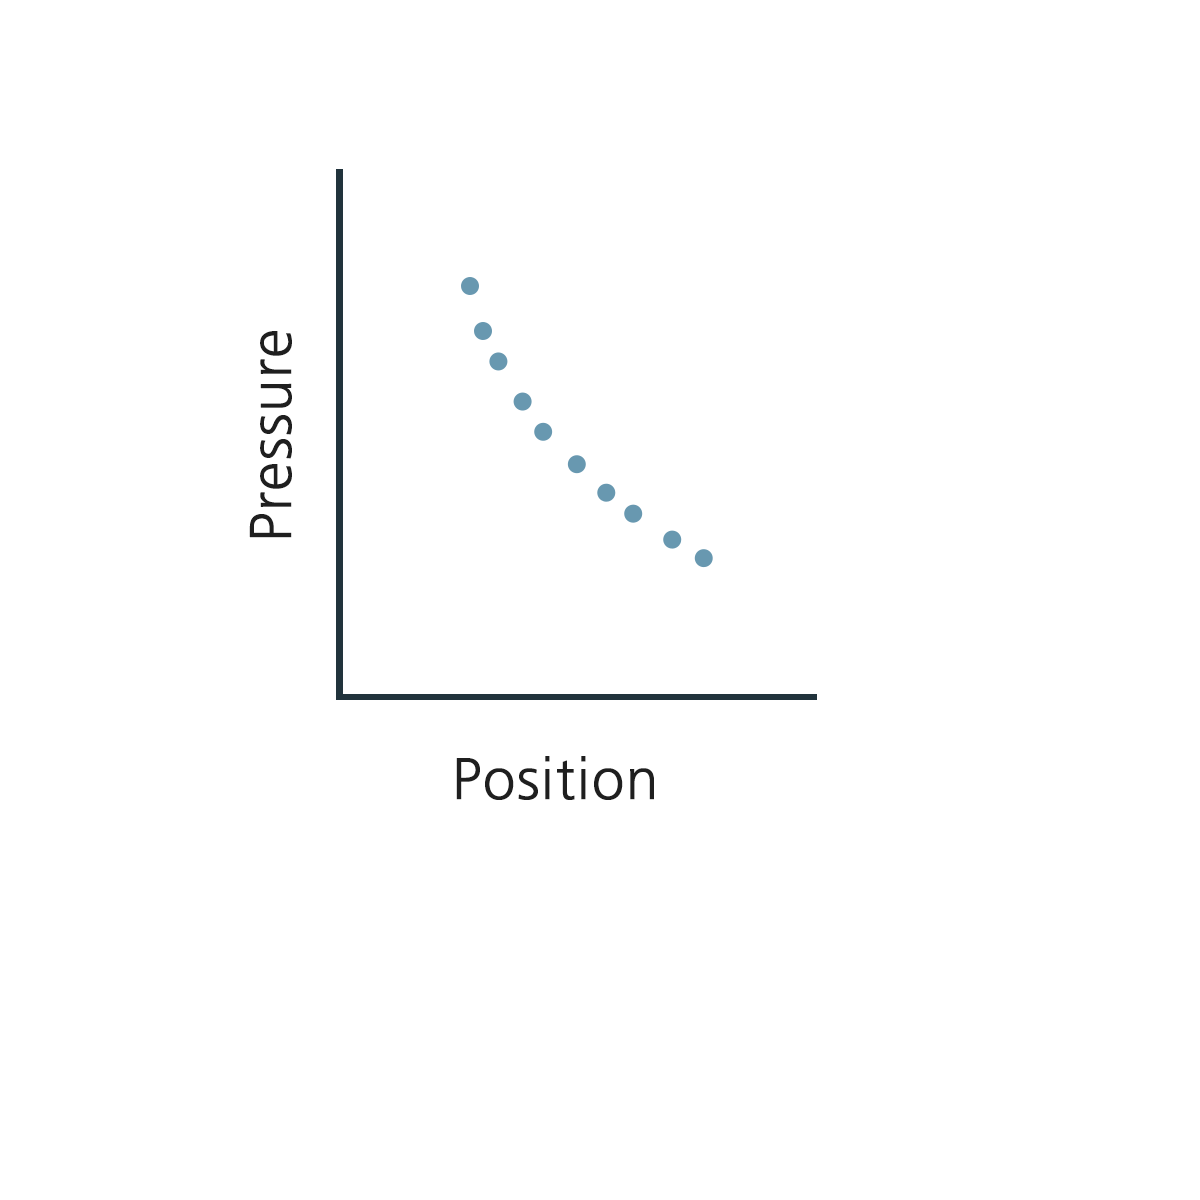 Pressure v Position